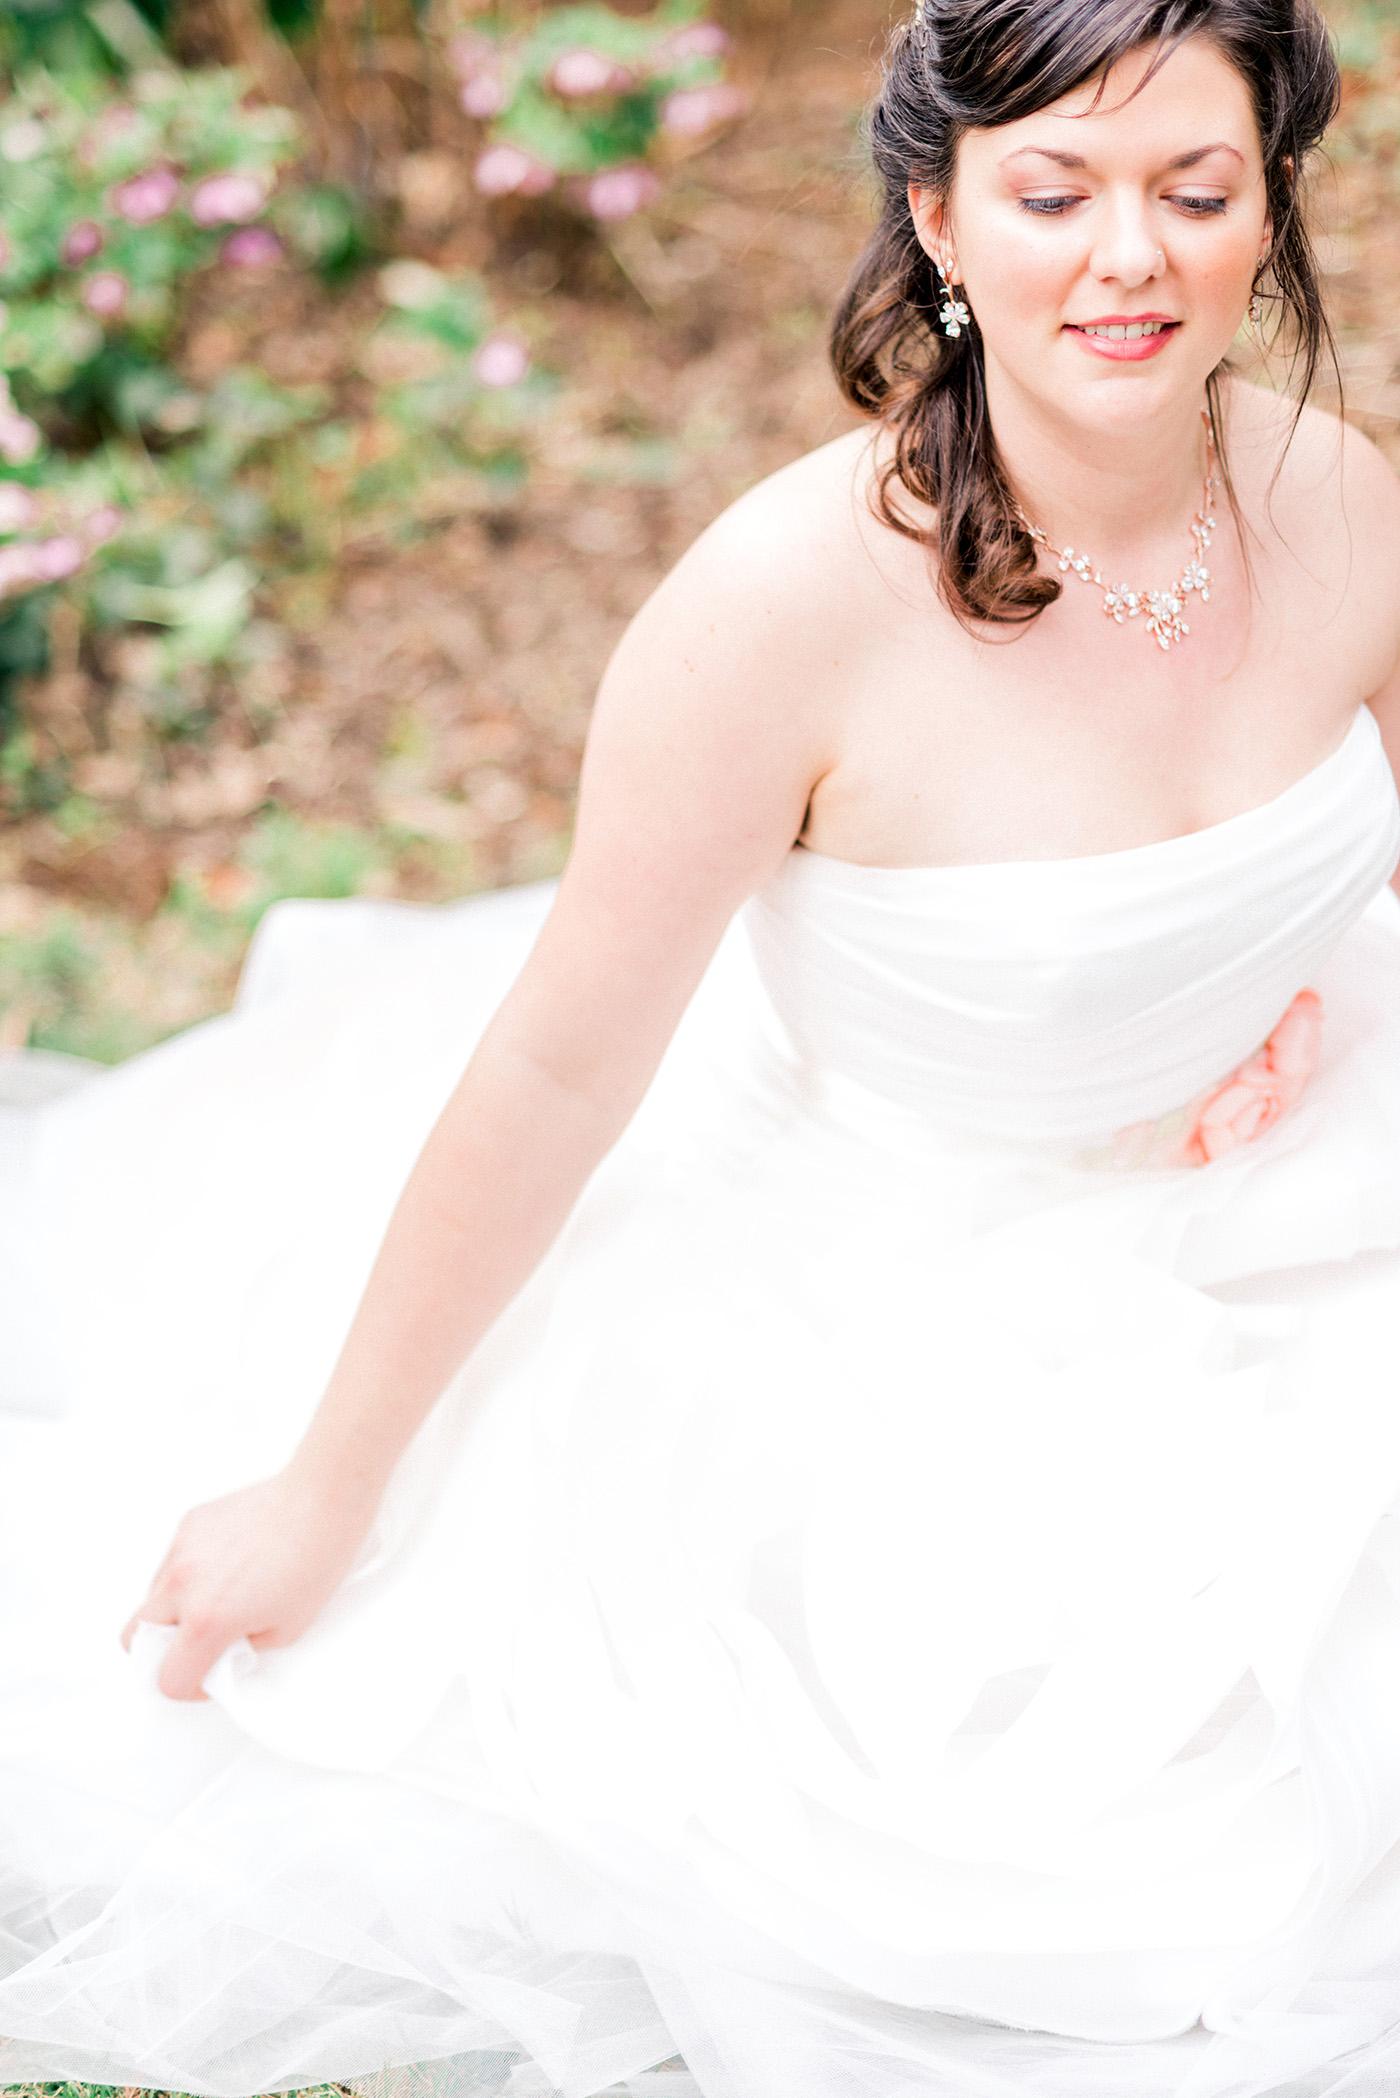 DianaElizabethPhotography_KatelinBridals024.JPG